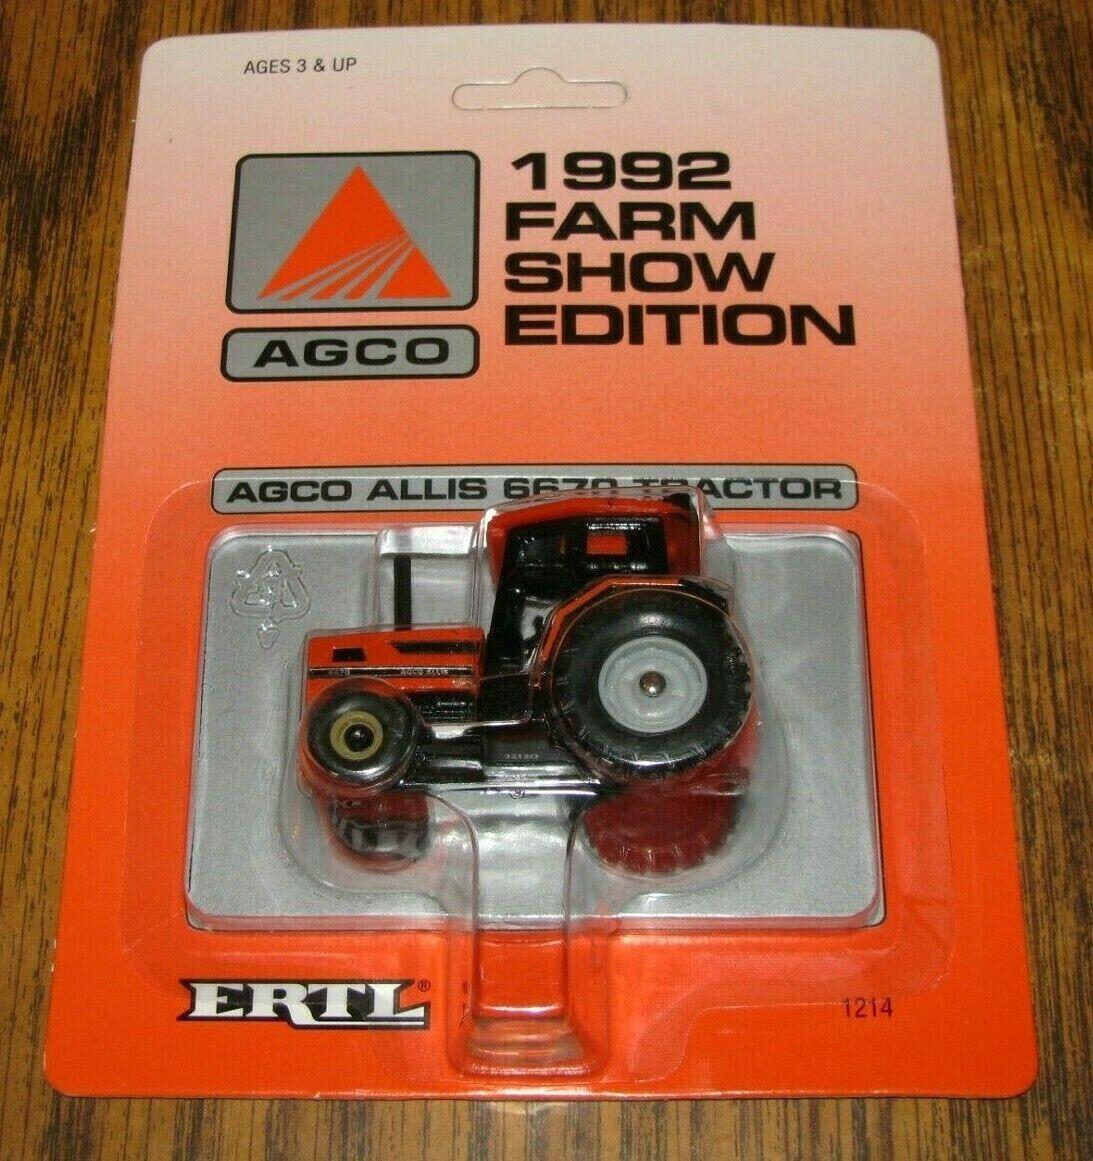 AGCO ALLIS 6670 Tractor 1/64 Ertl Toy #1214 Farm Show Edition 1992 Collectible